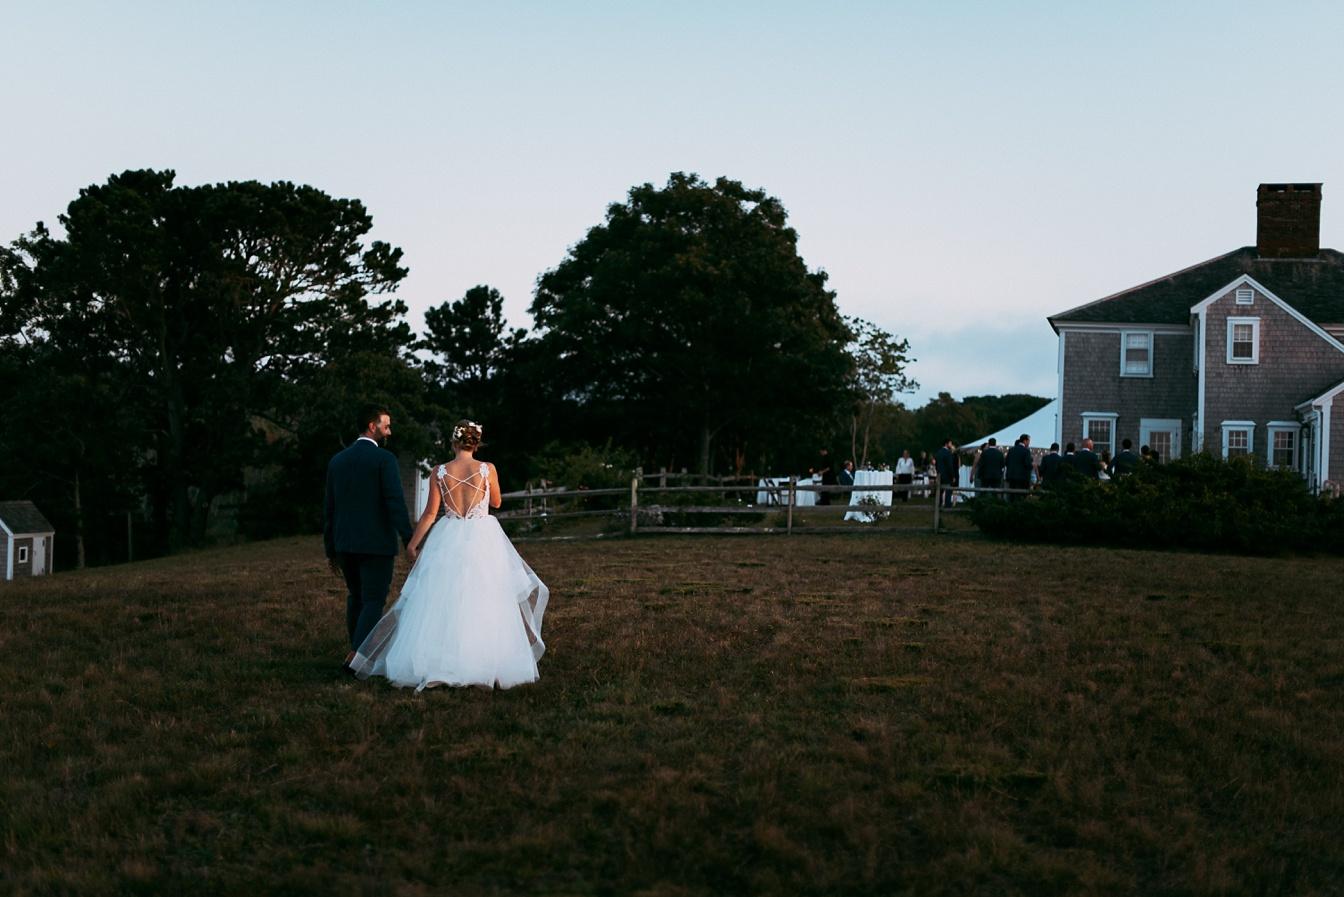 Eliza_Ben_Wedding_The_Foxes_Photography_546.jpg